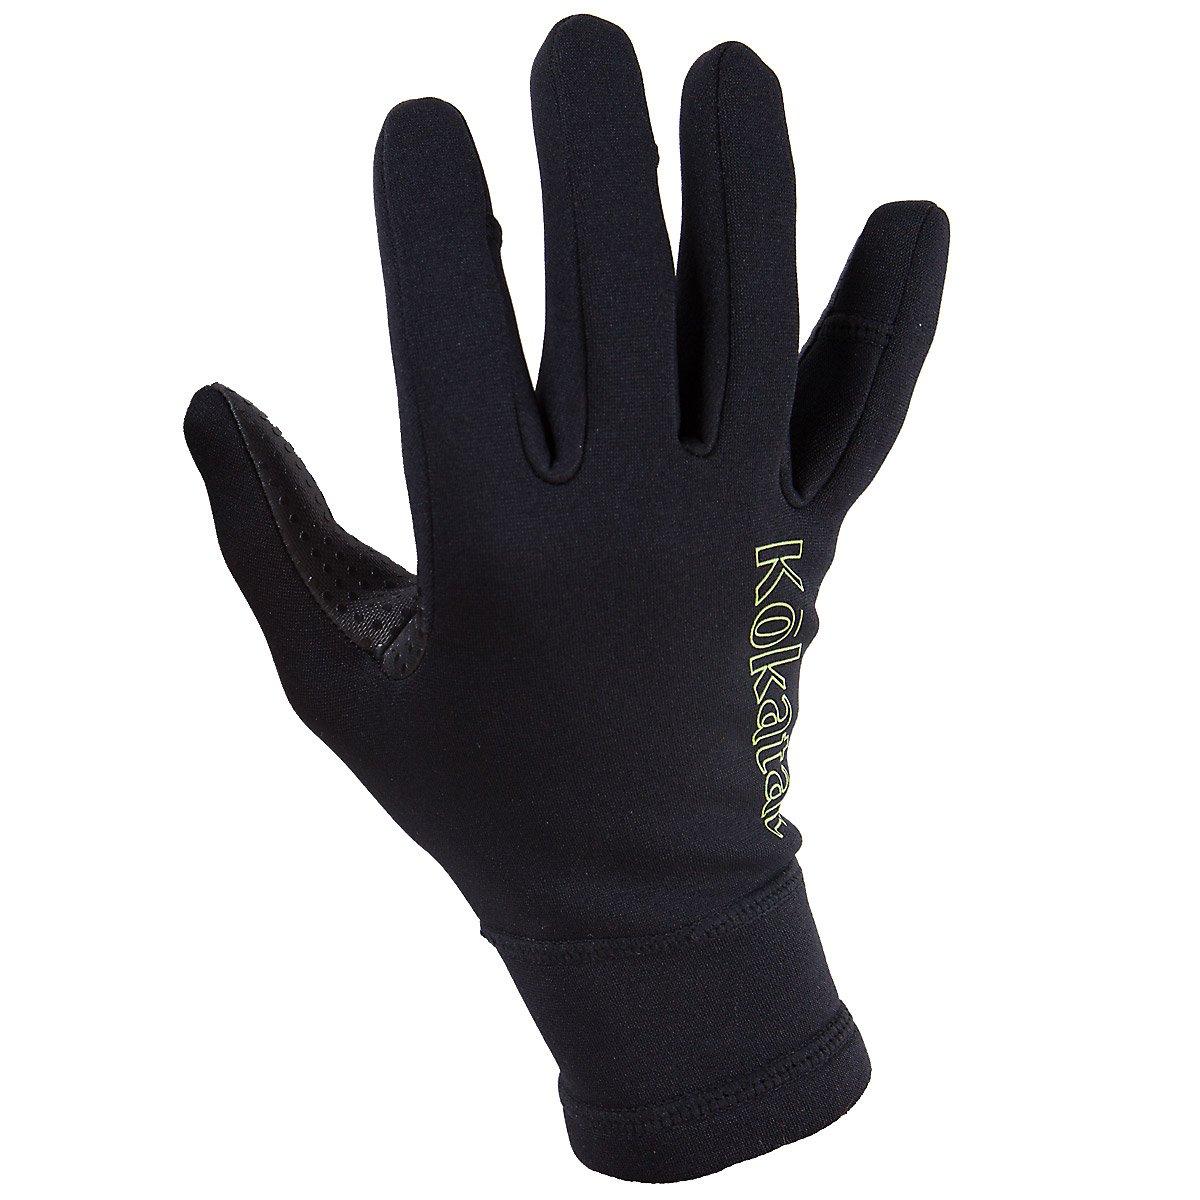 Kokatat Kozee Gloves-Black-S by Kokatat